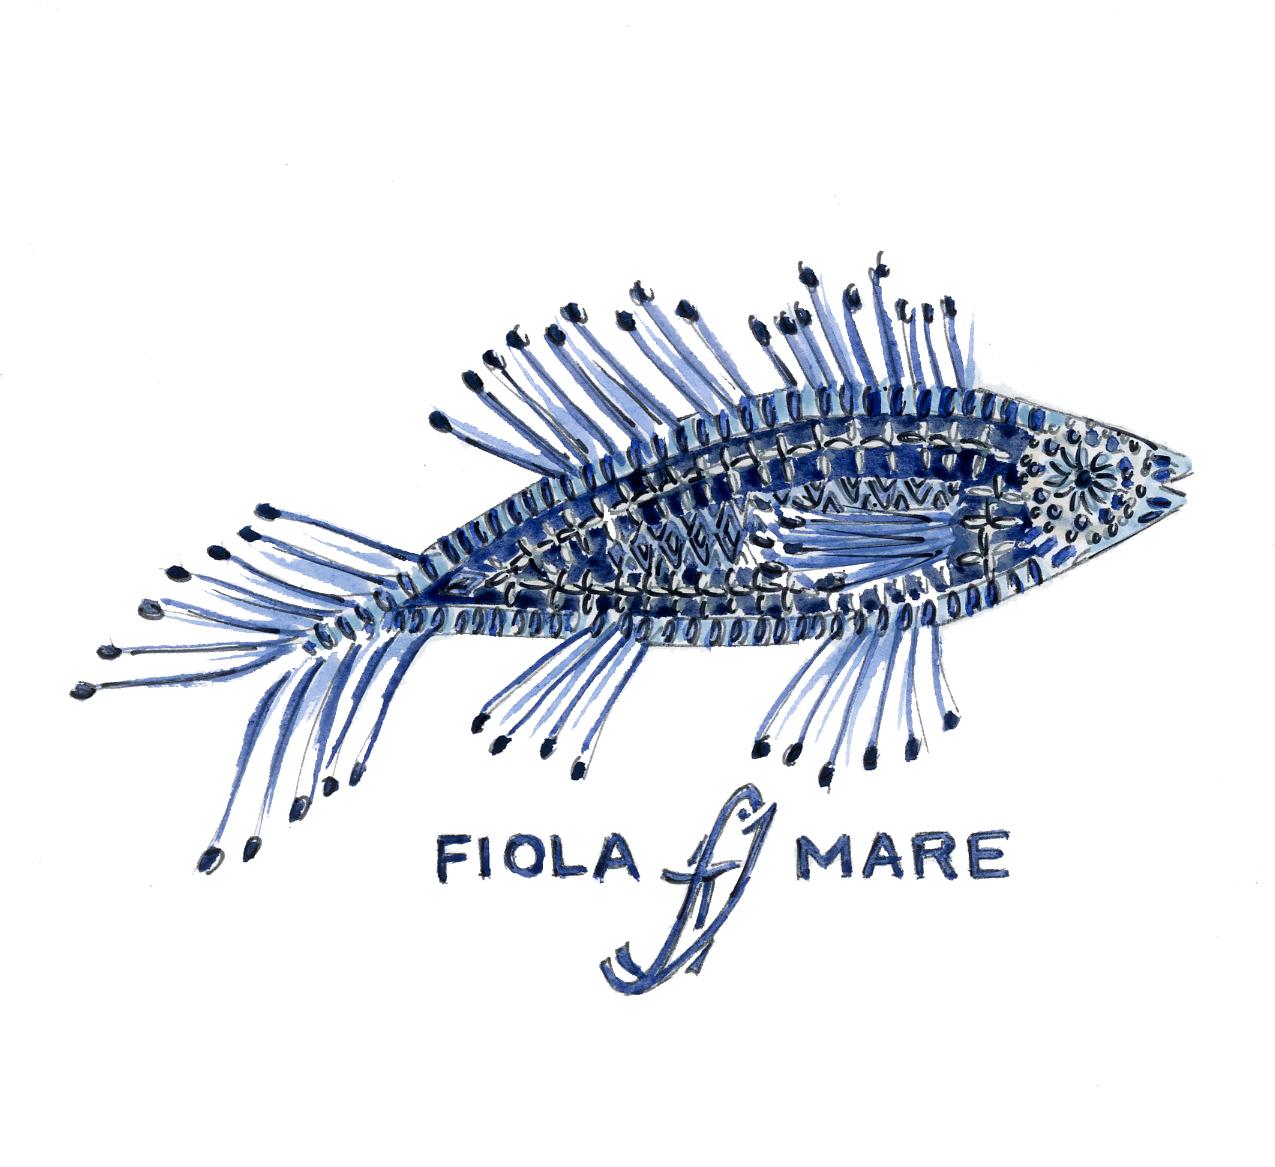 Artwork for Fiola Mare menu